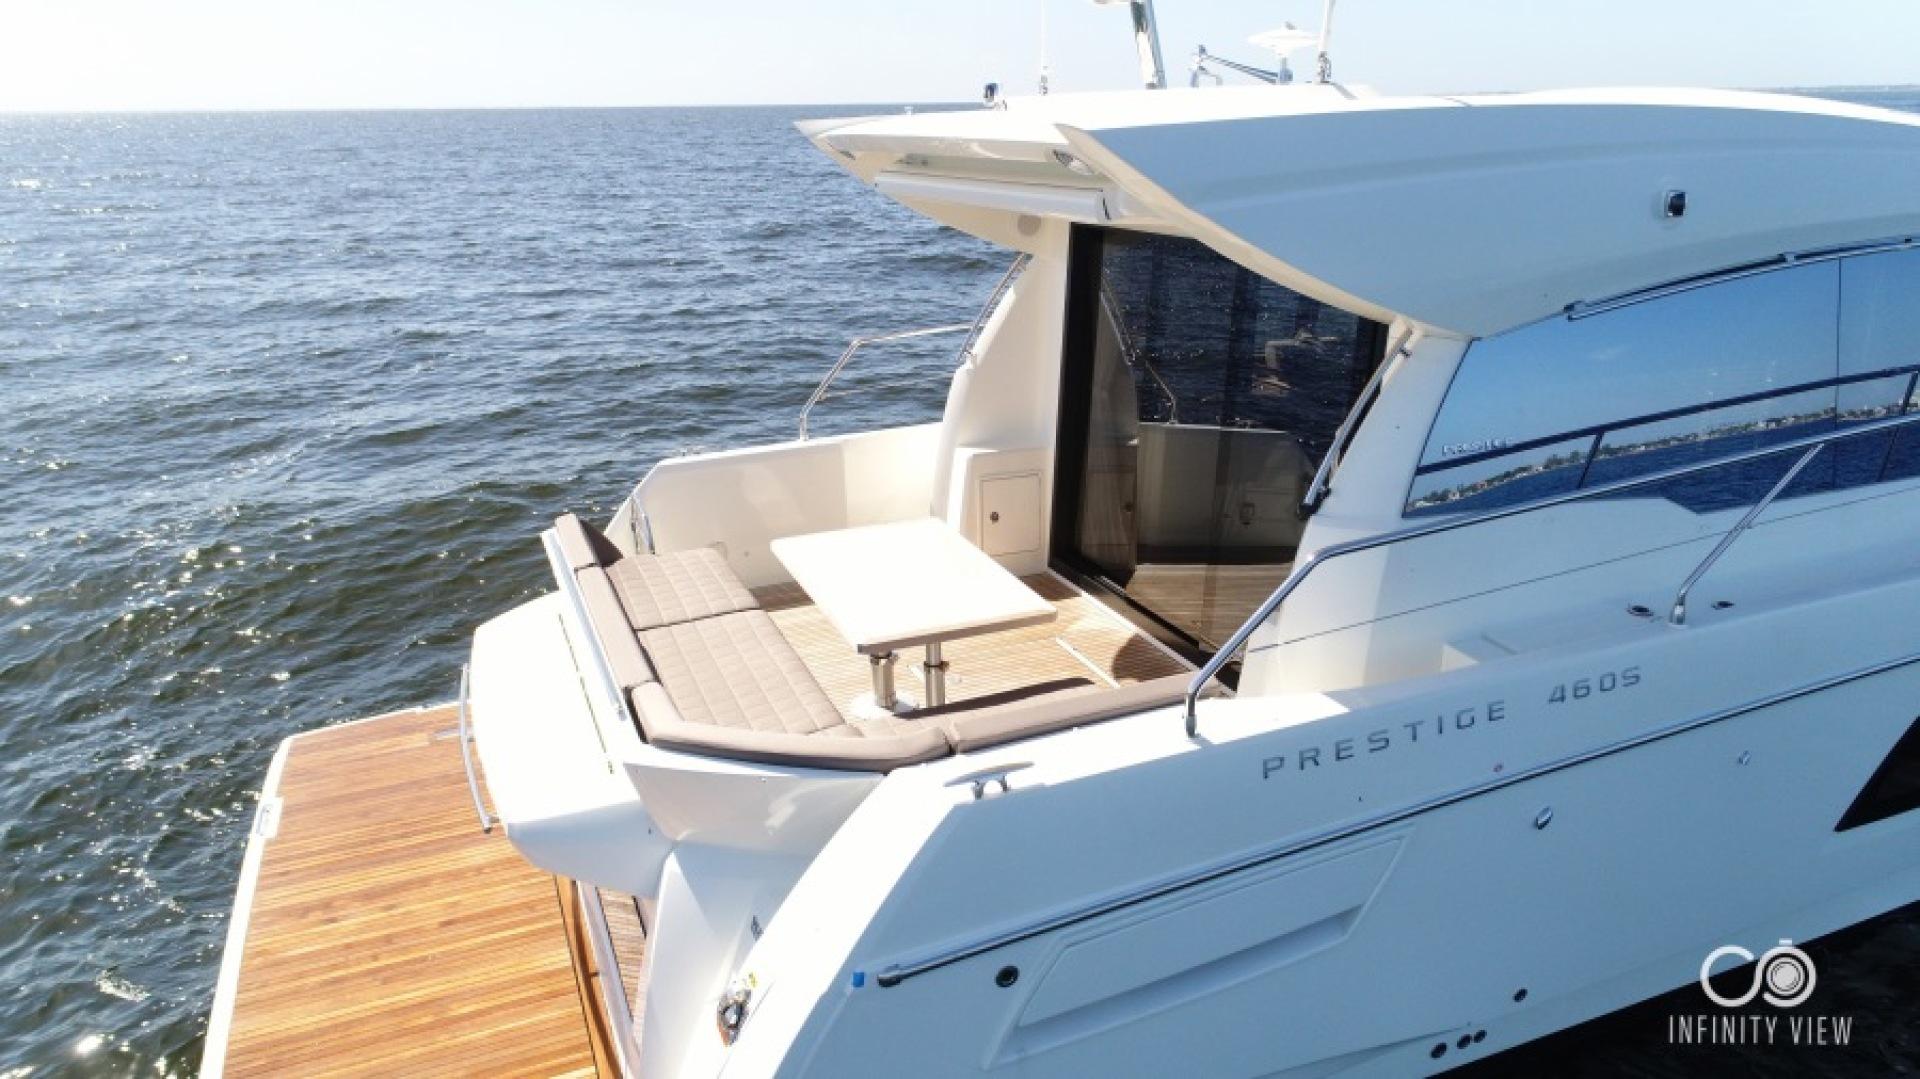 Prestige-460 S 2018-Unforgettable St Petersburg-Florida-United States-2018 Prestige 460 S Yacht  Unforgettable  Cockpit Profile-1444289   Thumbnail